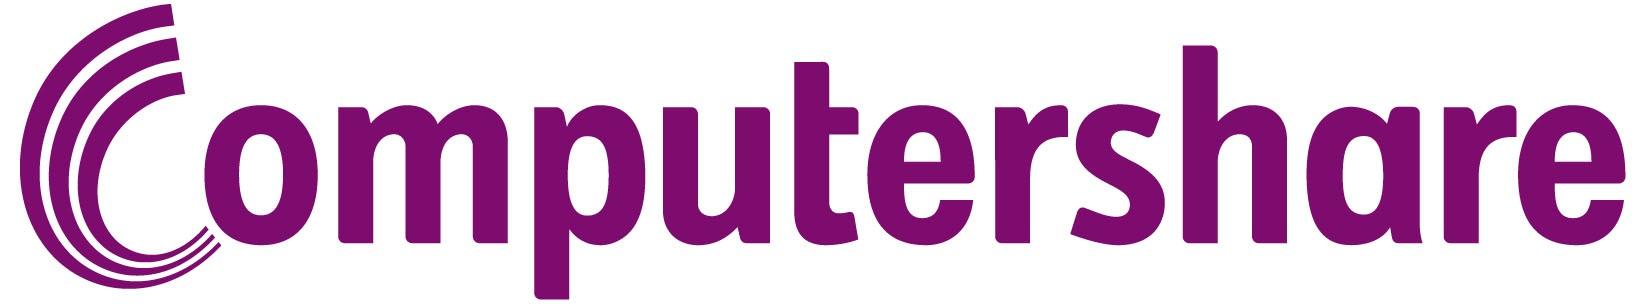 Computershare Logo Purple JPG